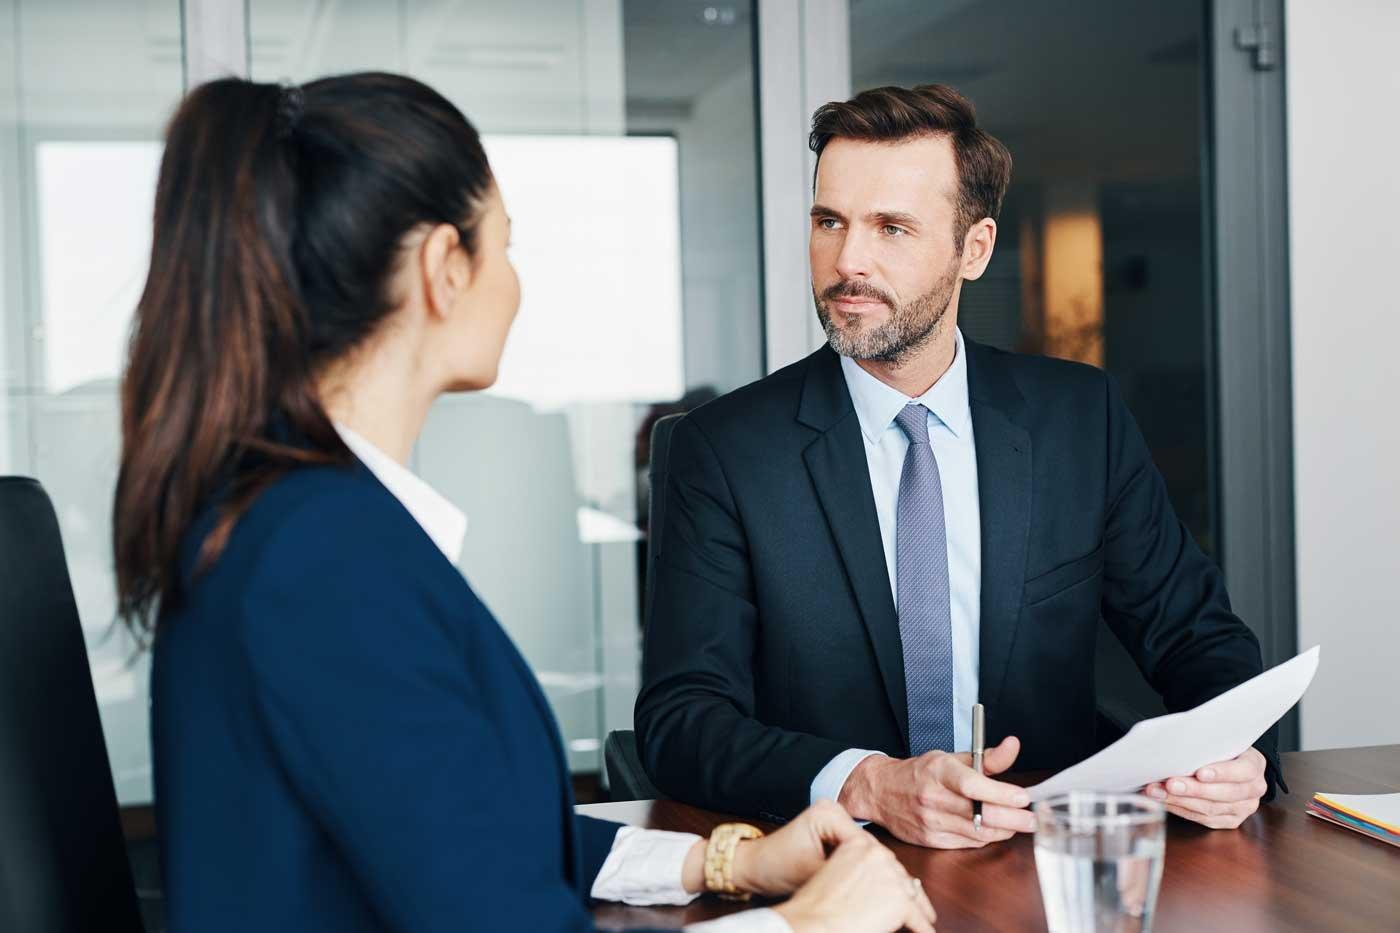 emp-interview-dealership-1400